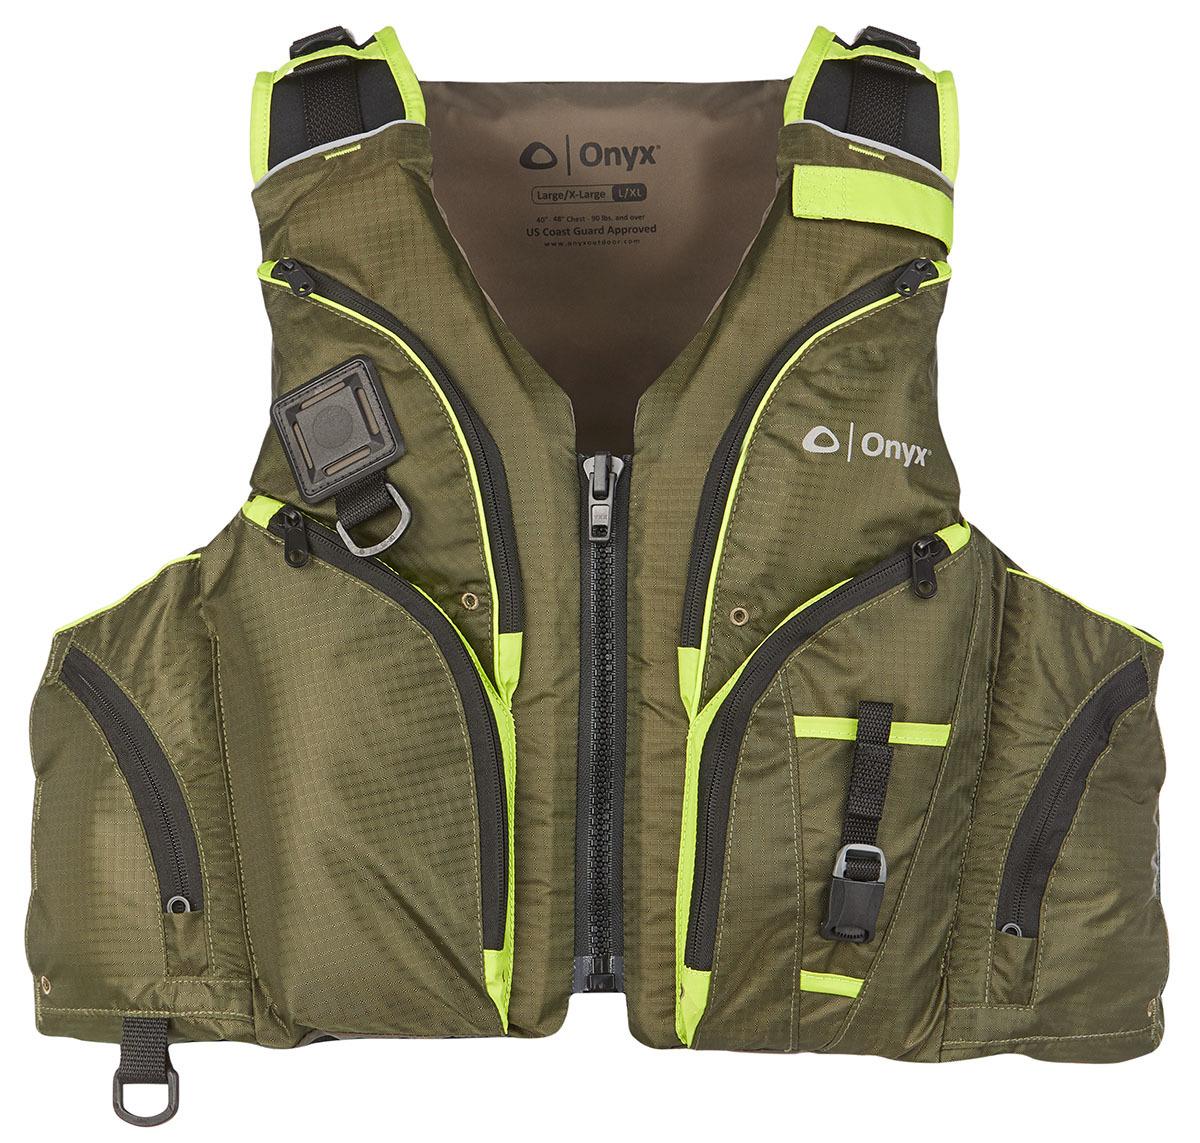 Onyx 120600-400-050-20 Pike Paddle Sports Life Jacket-Green L/XL